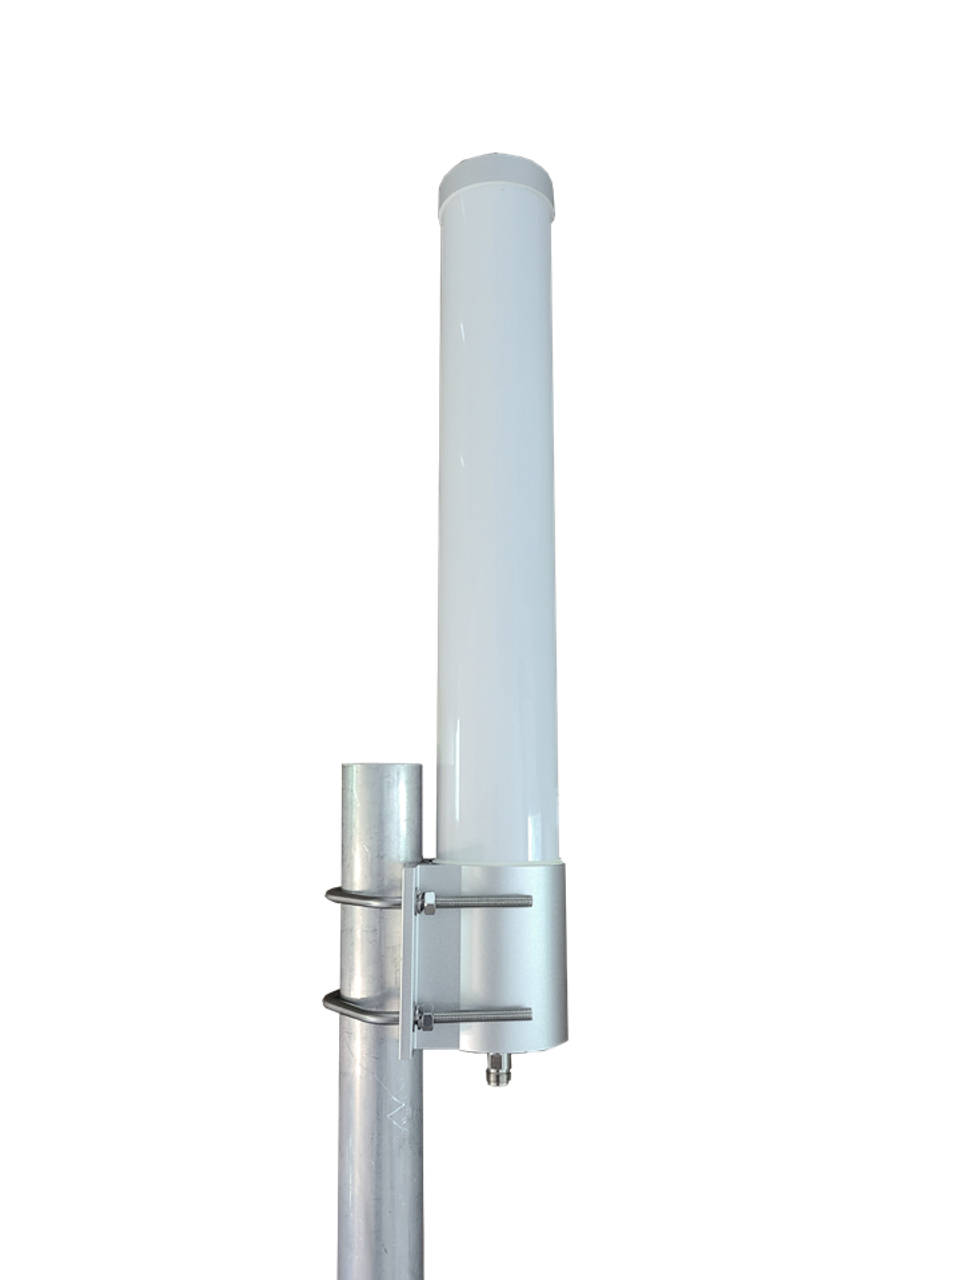 M25 Omni Directional 4G LTE CBRS 5G NR M2M IOT Antenna - Pole Mount